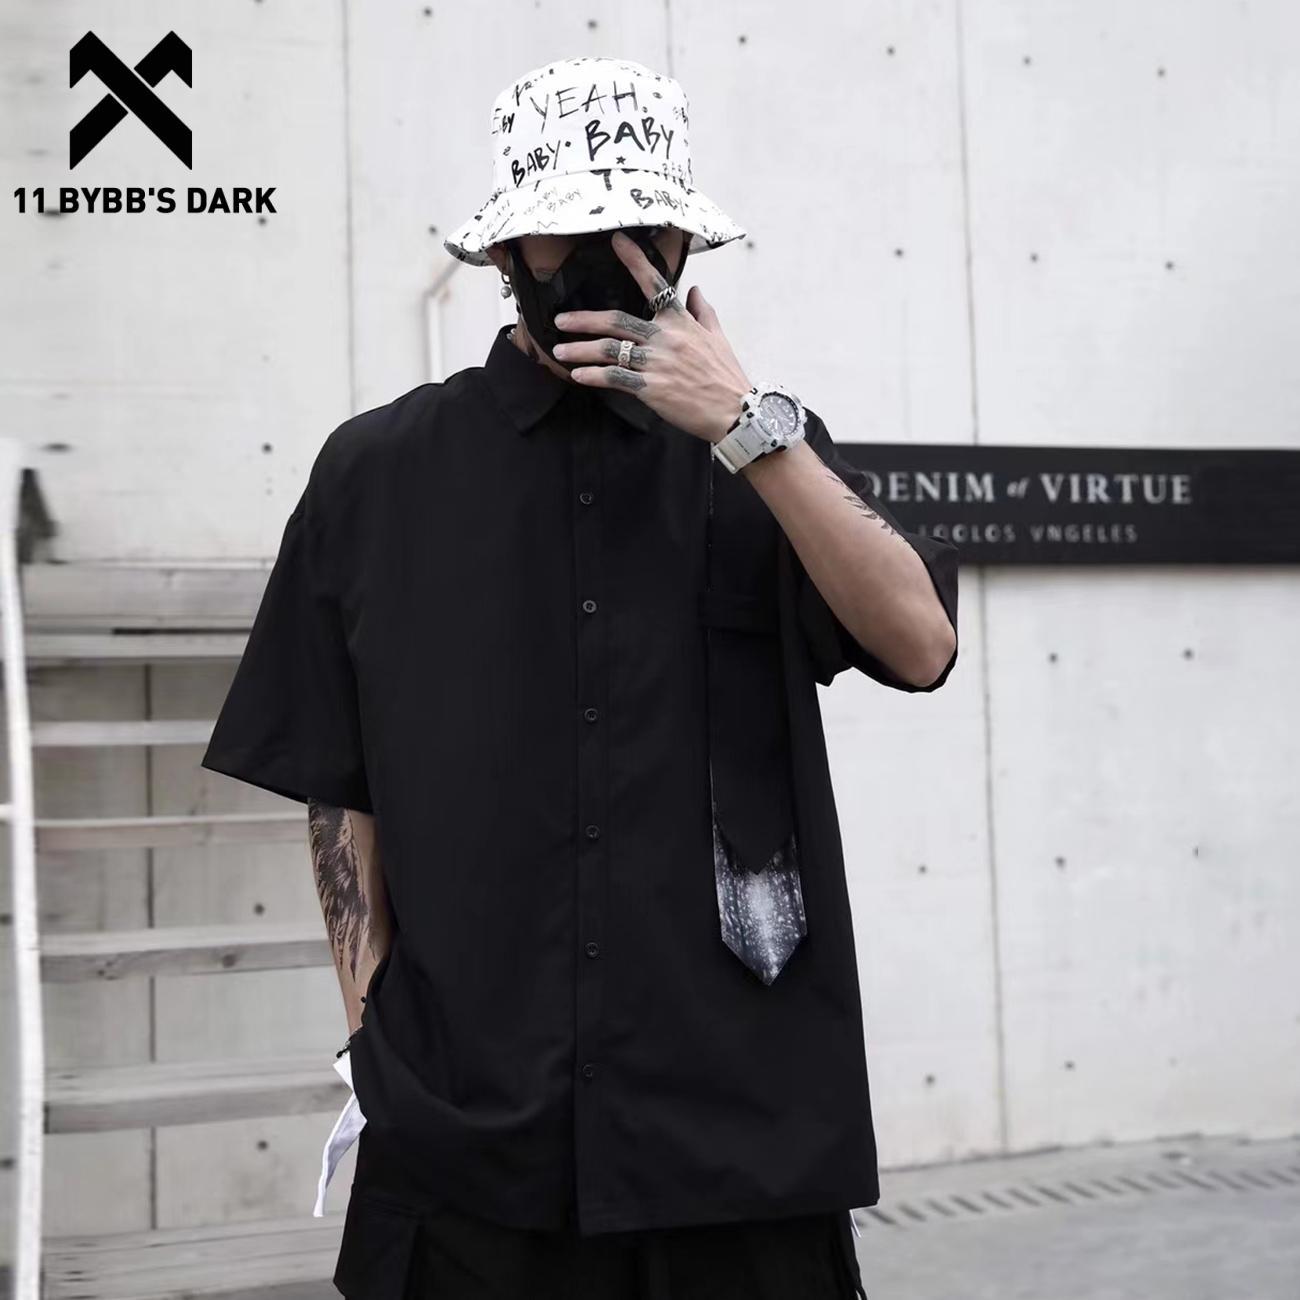 11 BYBB'S DARK 2021SS الإبداعية التعادل المرقعة Harajuku قمصان الرجال الصيف الشارع الشهير قميص القطن الداكن فضفاض قمصان قصيرة الأكمام